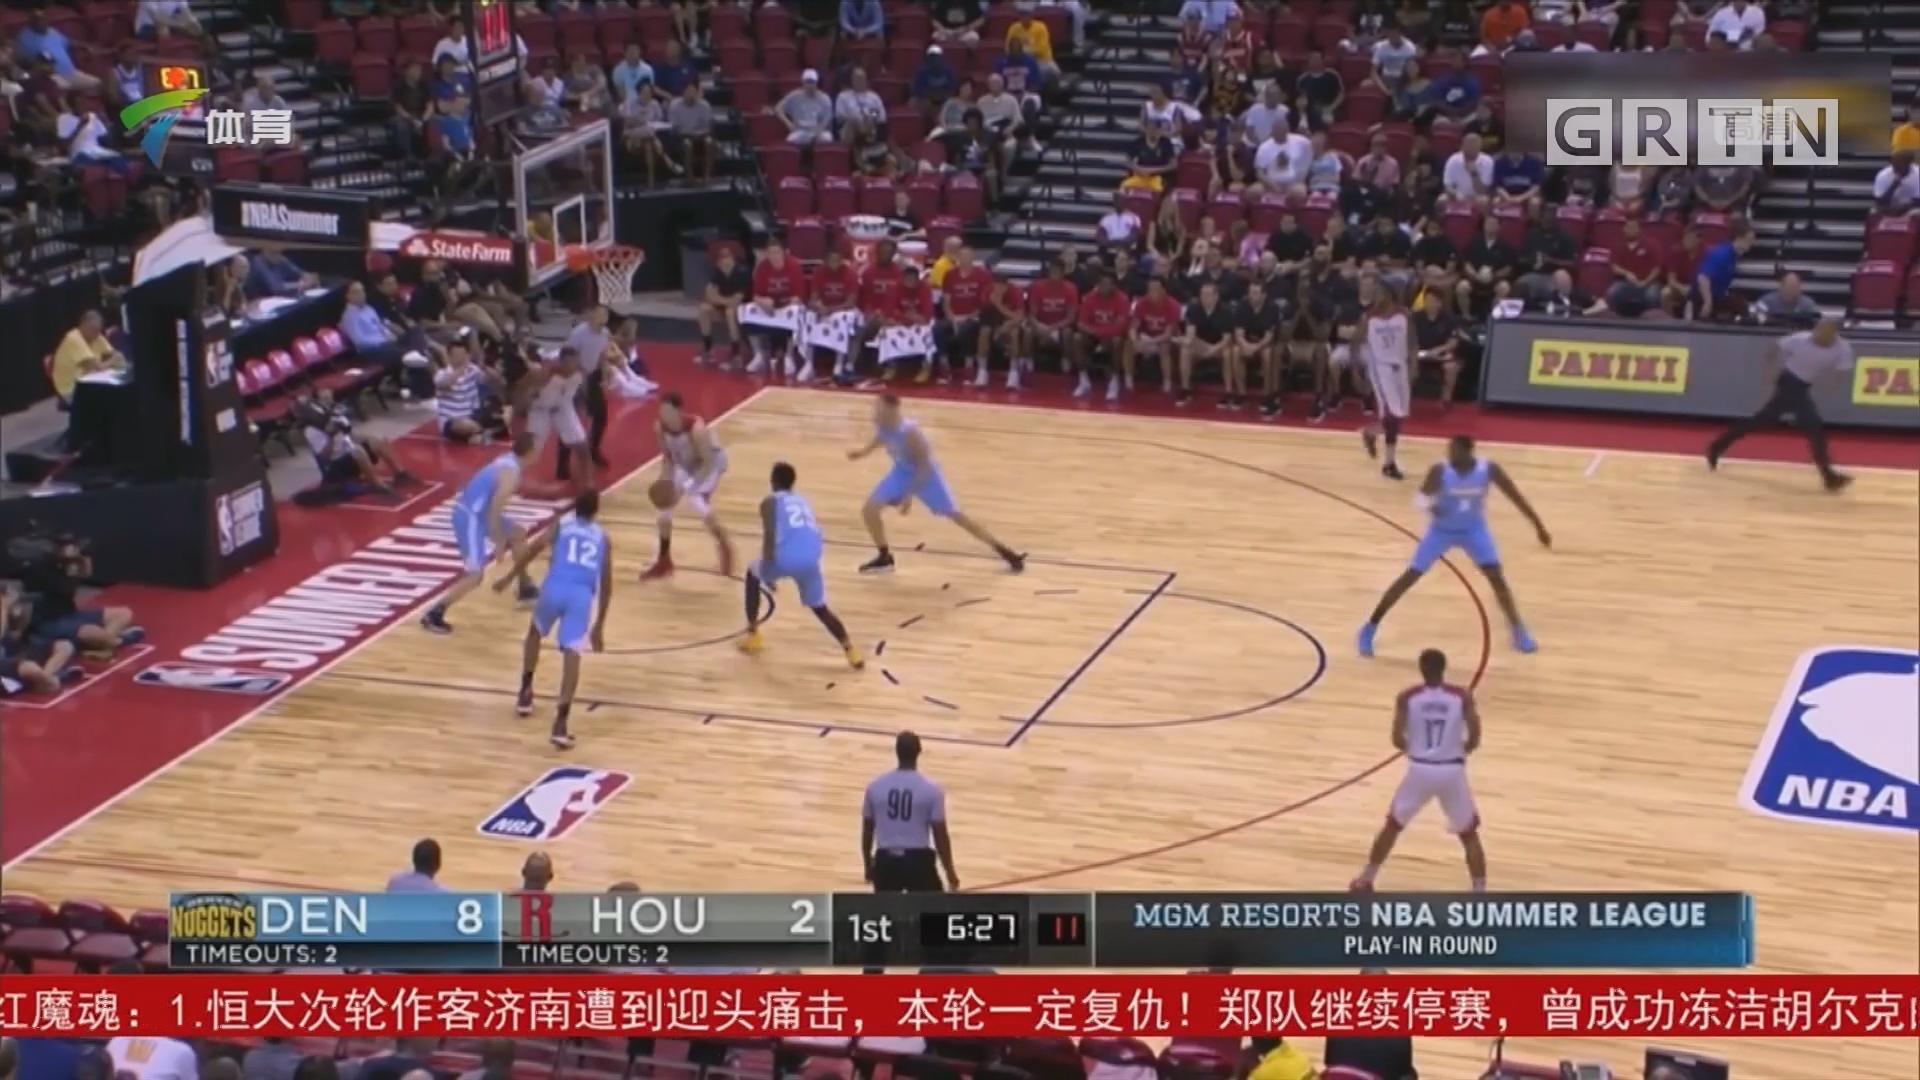 NBA夏季联赛:火箭不敌掘金 周琦4分3板1盖帽